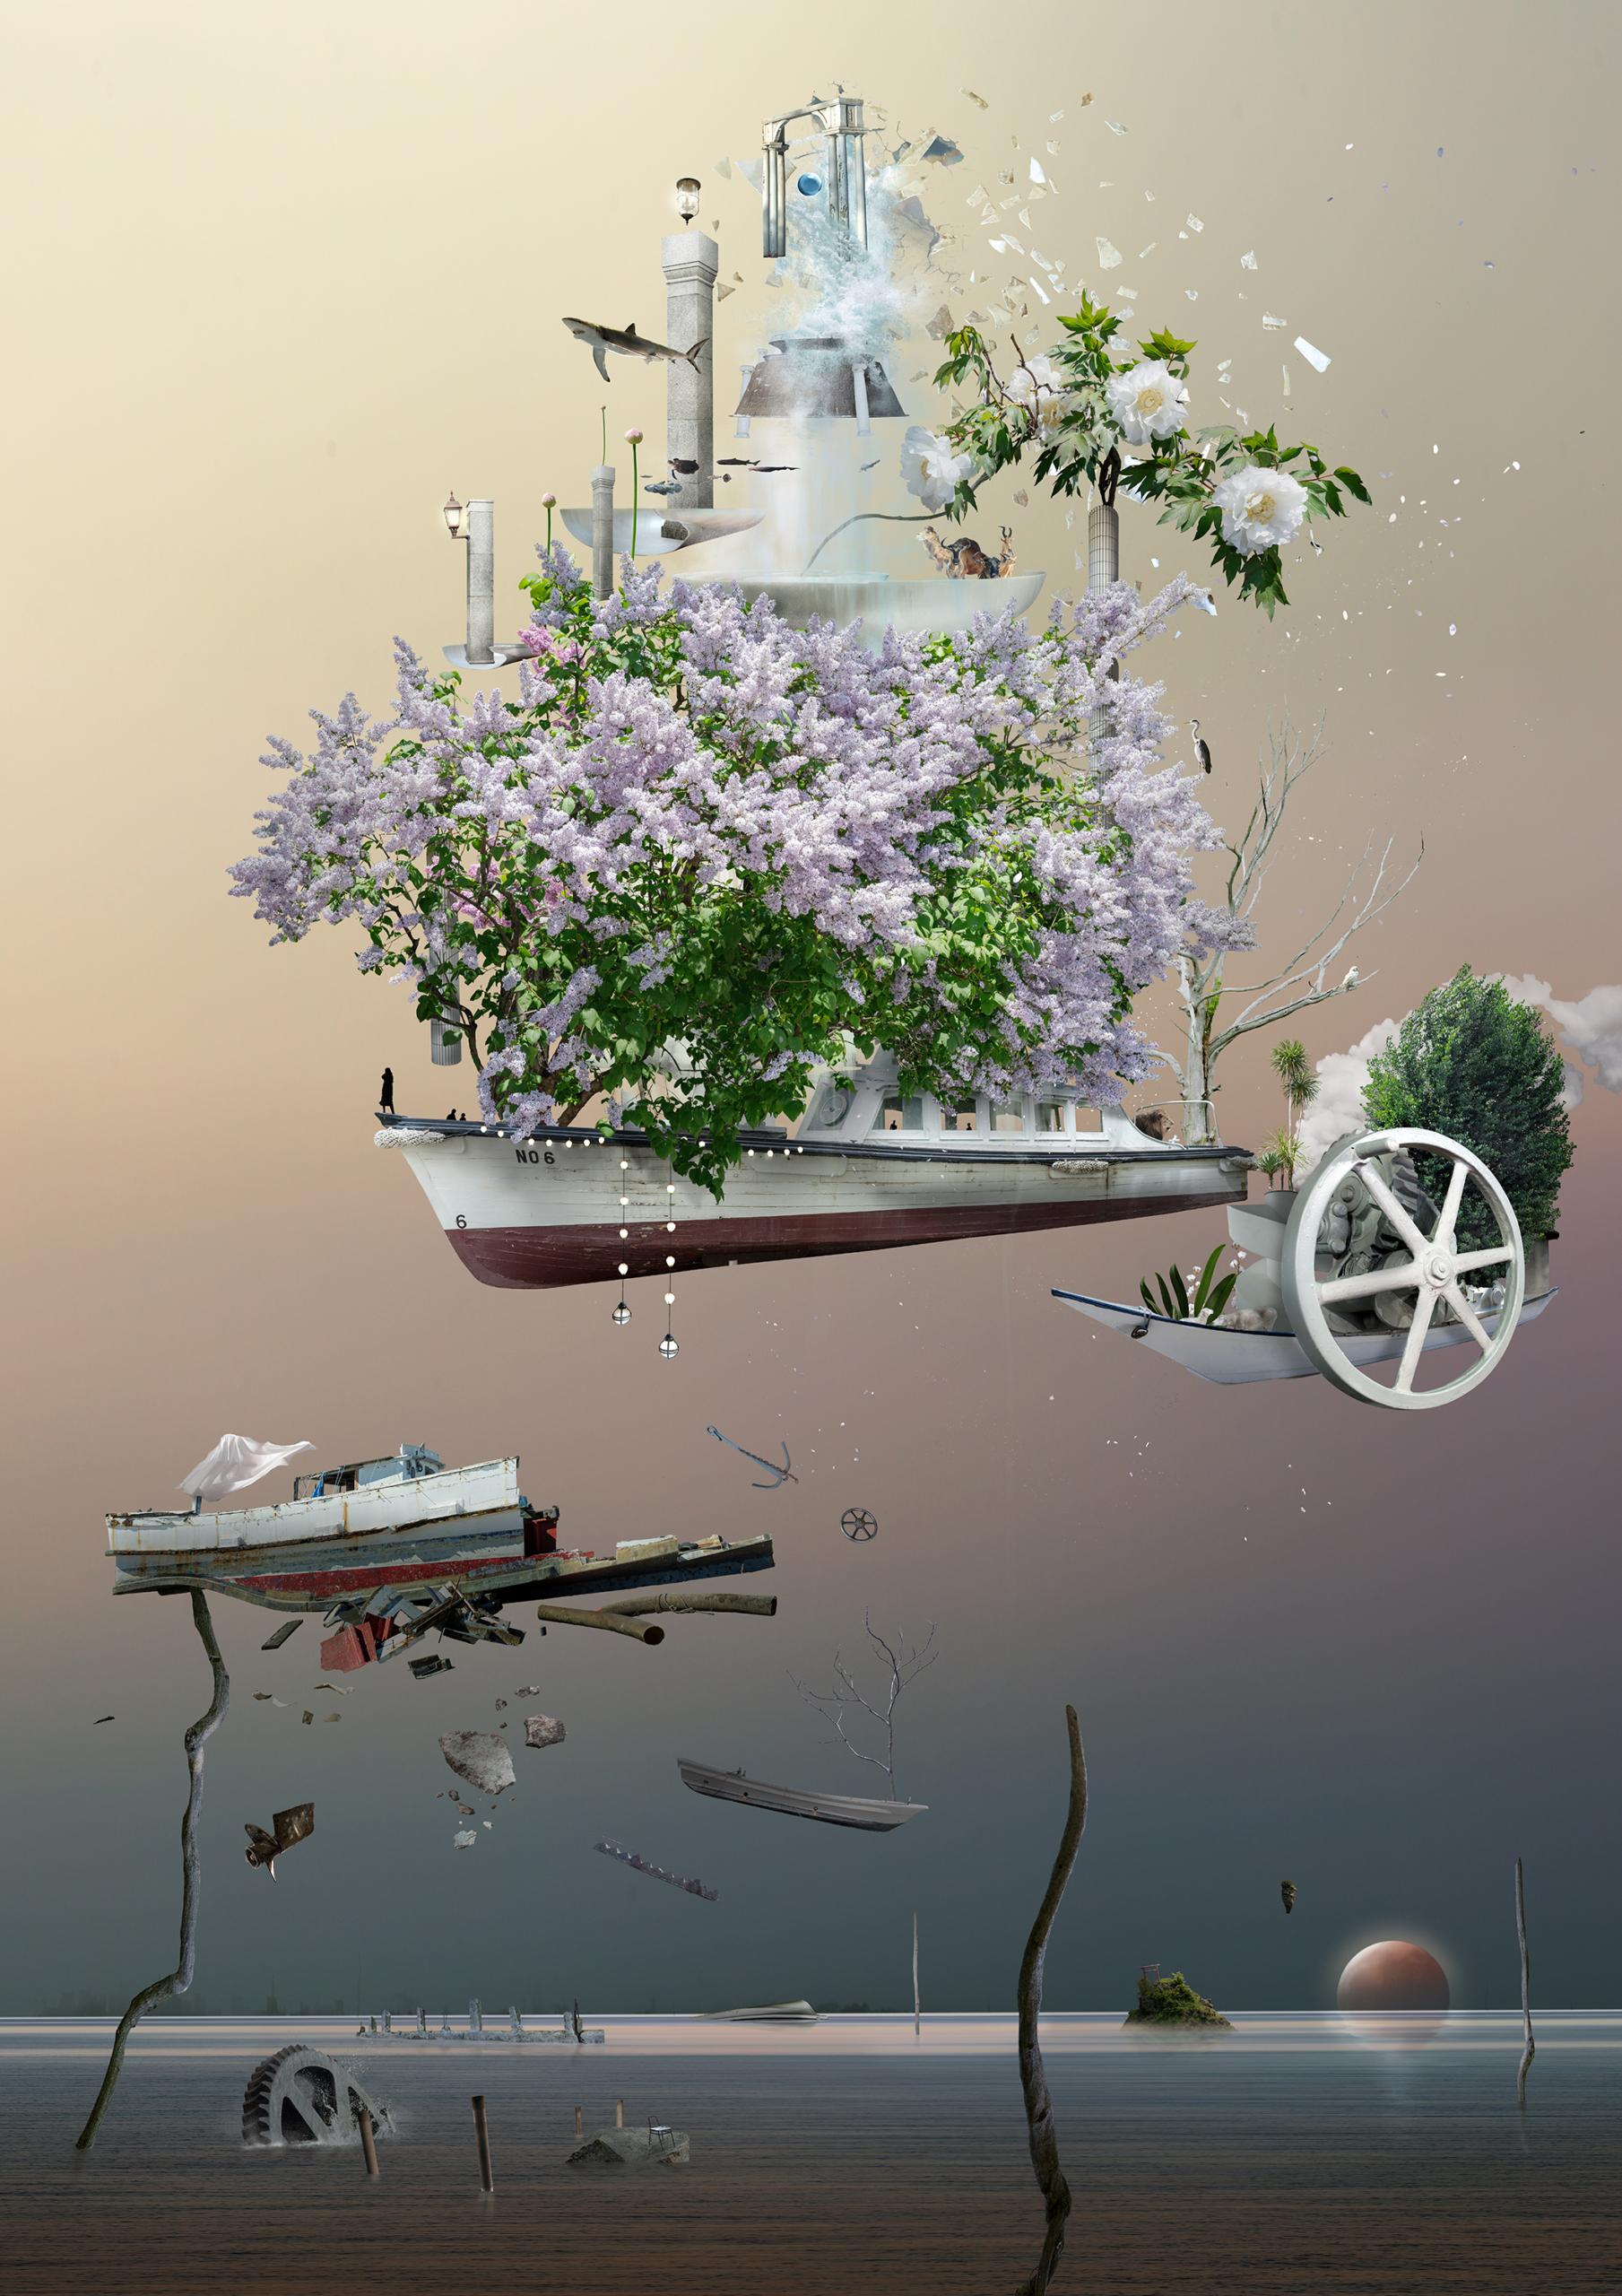 Celebration of embarkation